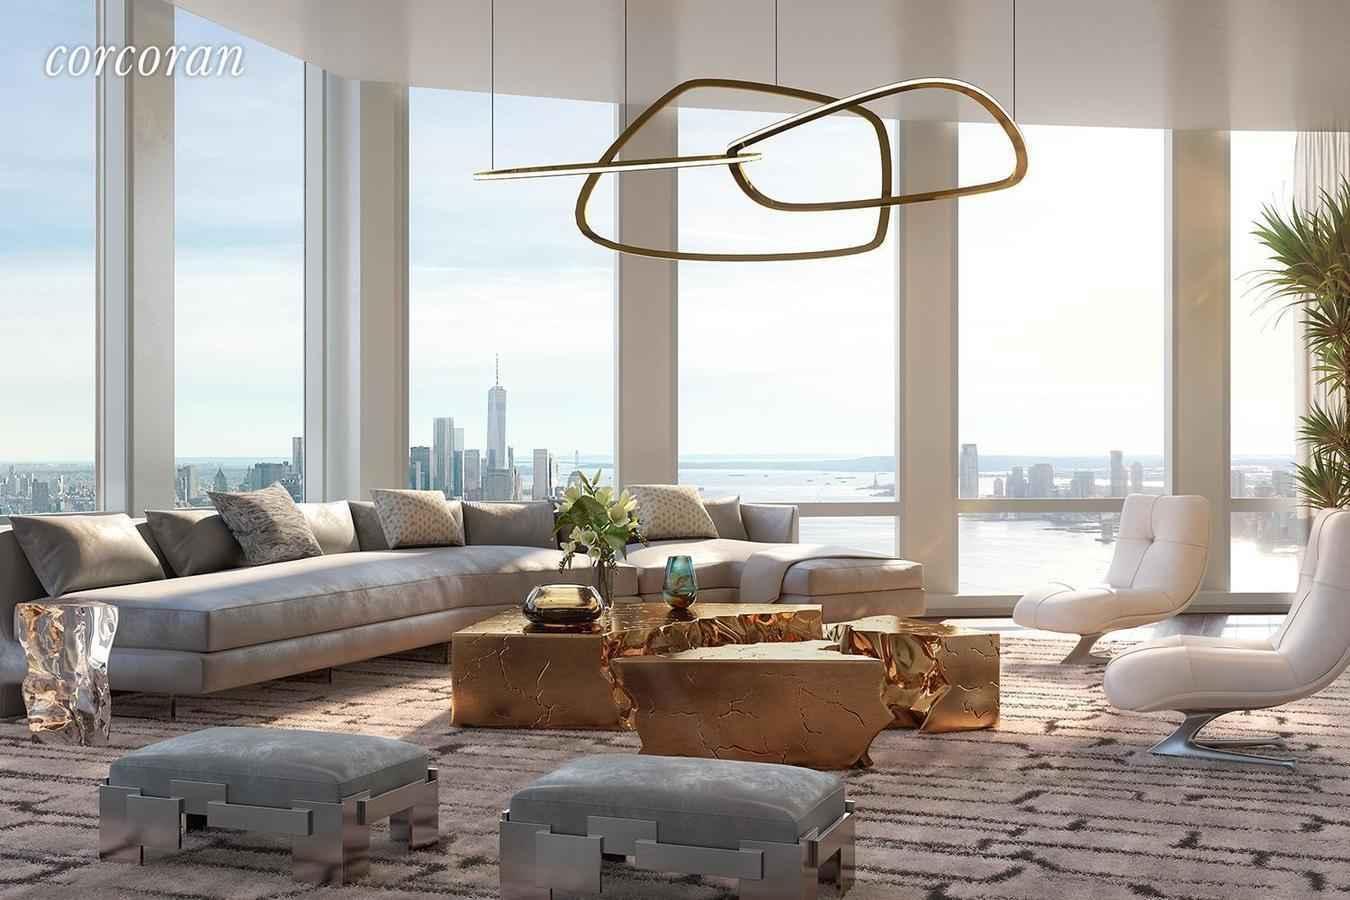 Apartment for sale at 35 Hudson Yards, Apt 7401